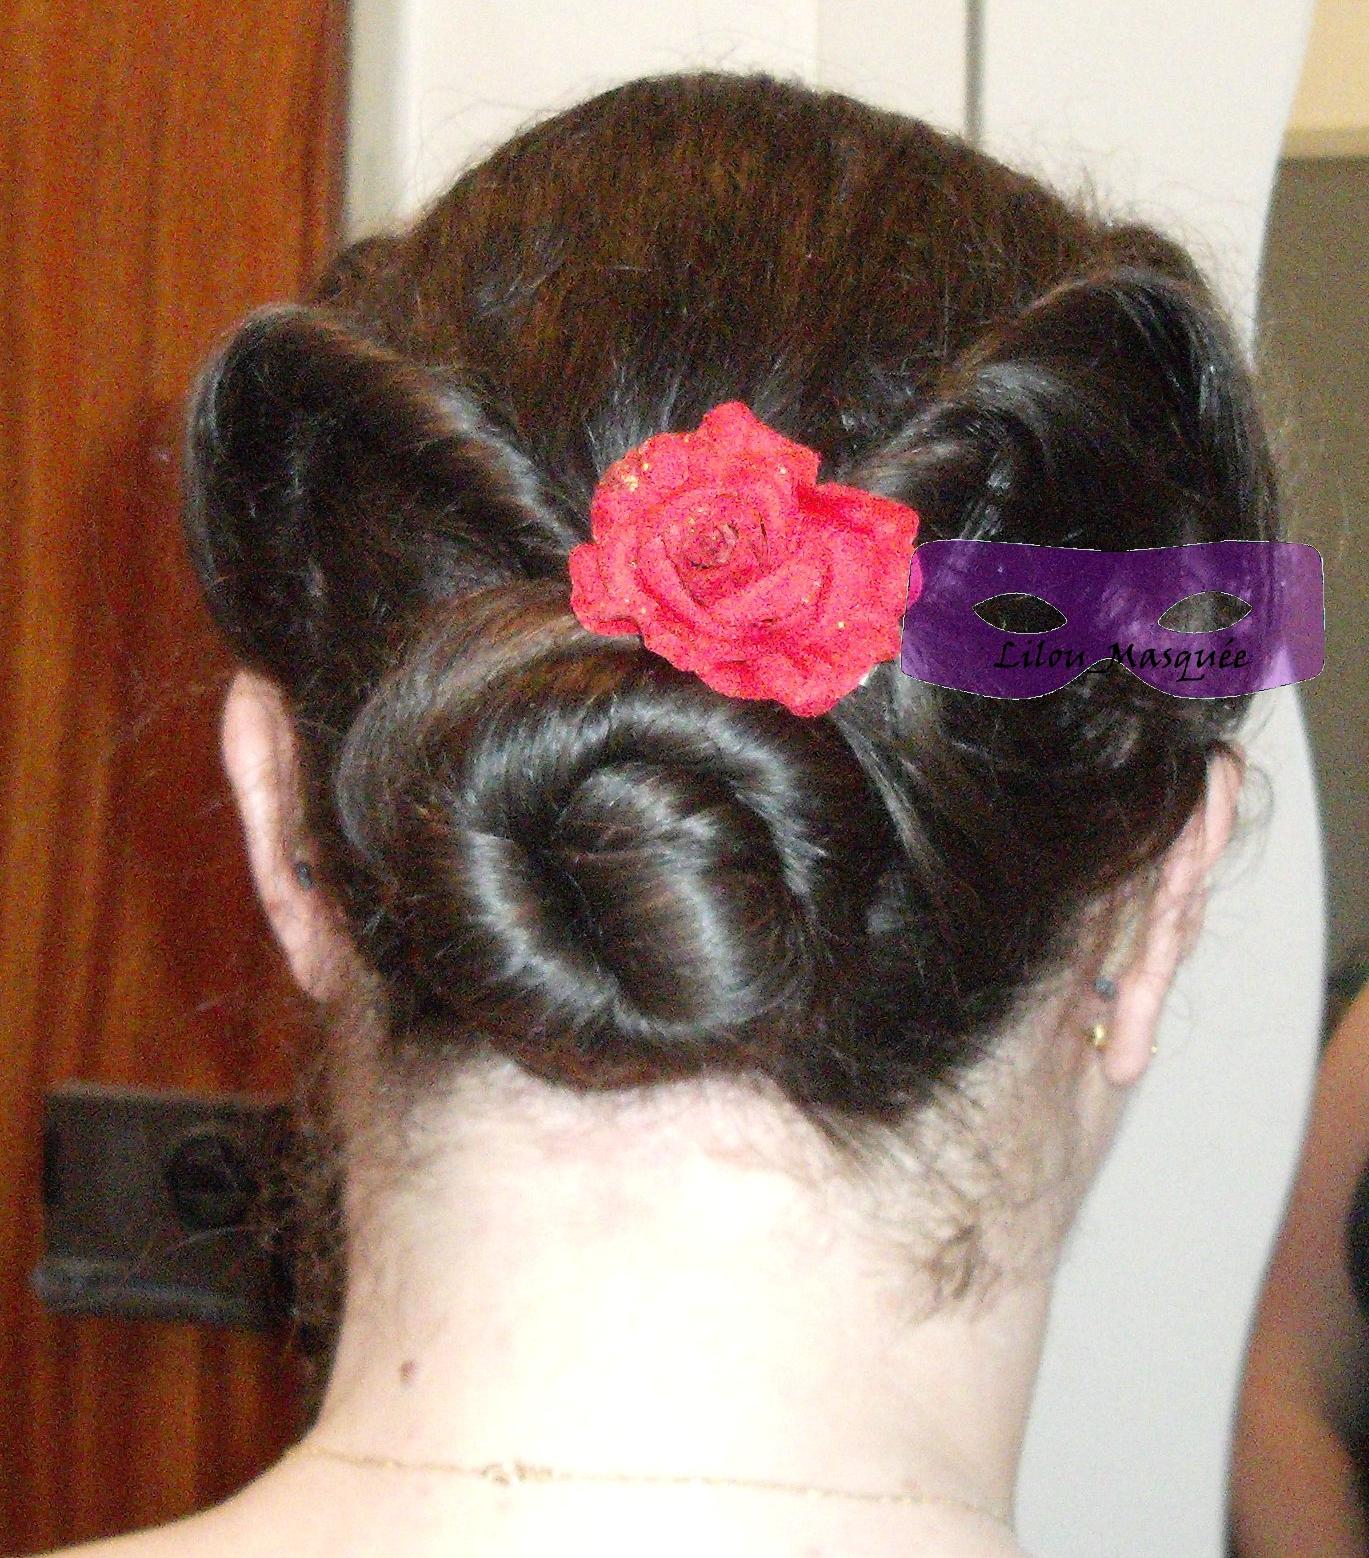 http://3.bp.blogspot.com/-ojFTfetFE5A/Tw6ulfUDlCI/AAAAAAAAAbk/Go0pcHa6KCE/s1600/Chignon+style+pin+up+ann%25C3%25A9es+40+hairdo+updo+Dutt+tuto+tutoriel+tutorial+1001+coiffures+1.JPG